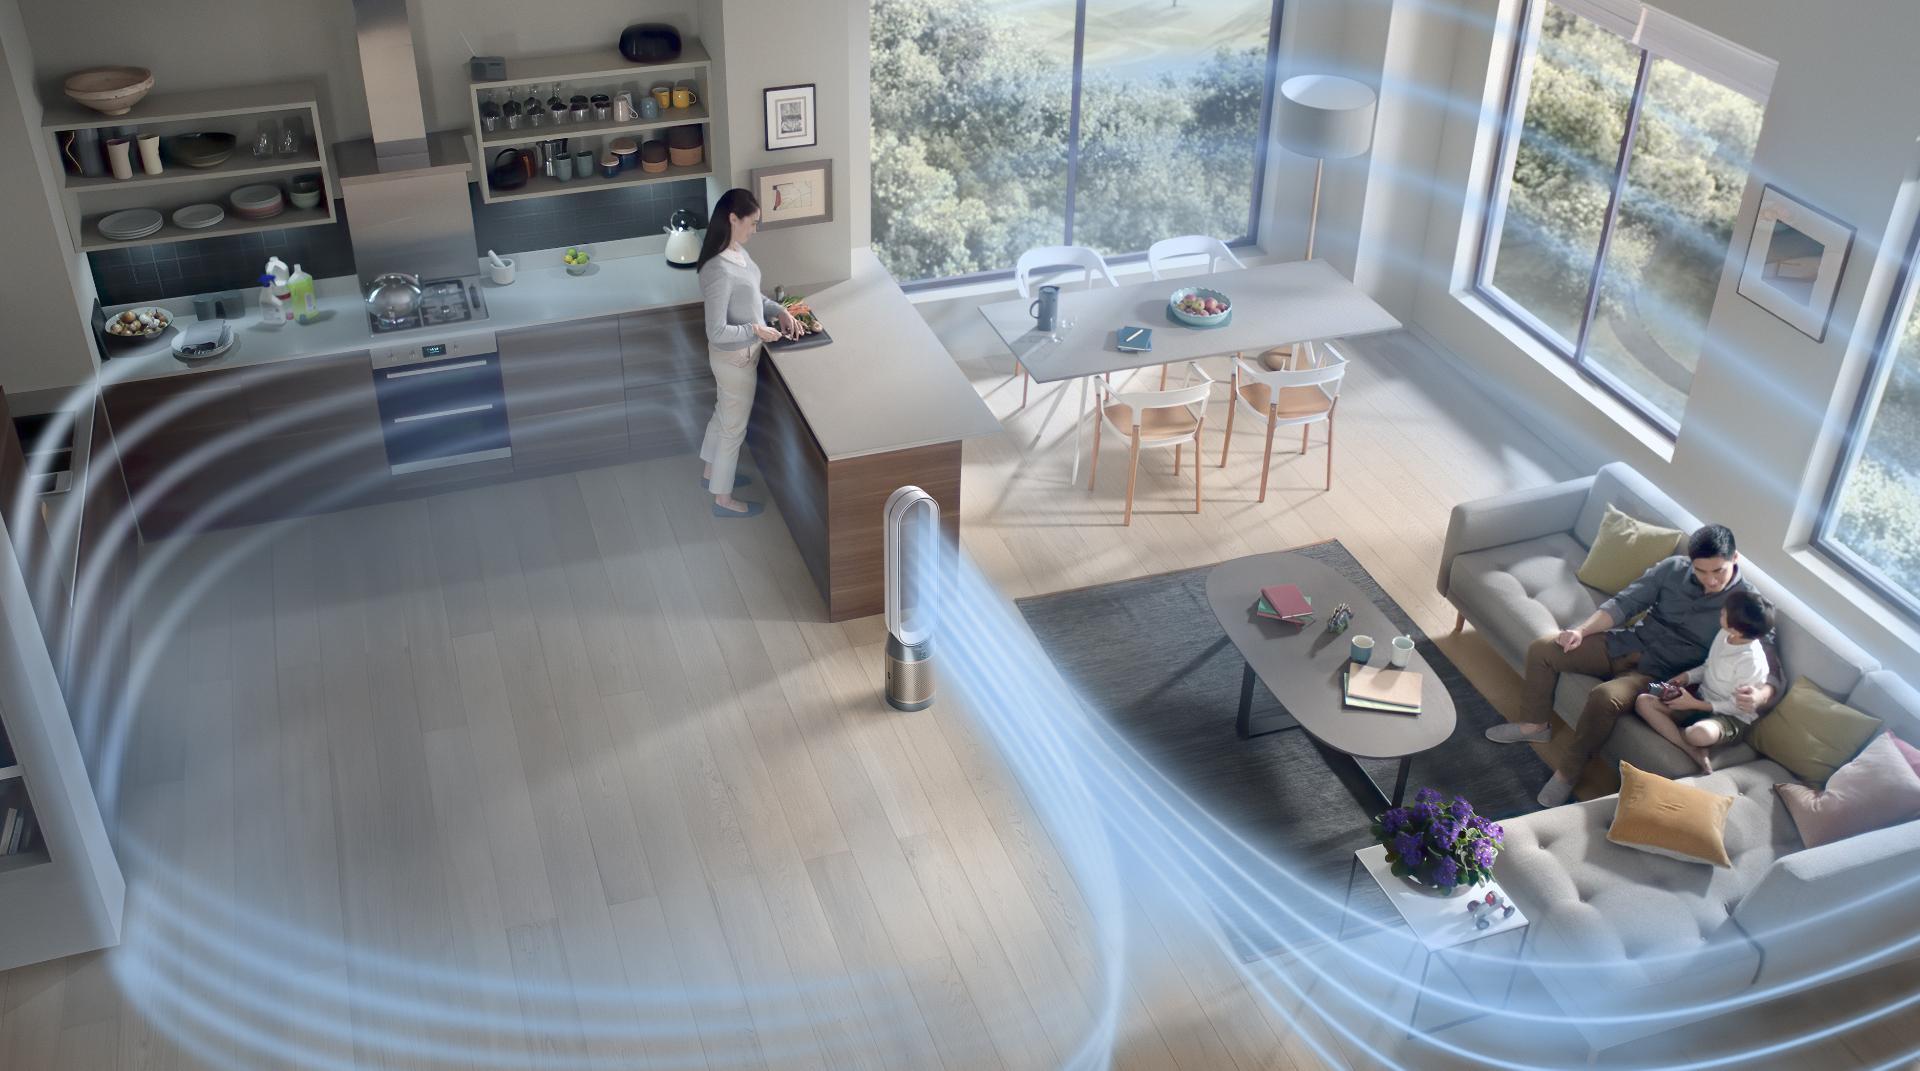 Dyson purifier cool formaldehyde air purifier fan purifying a large living space